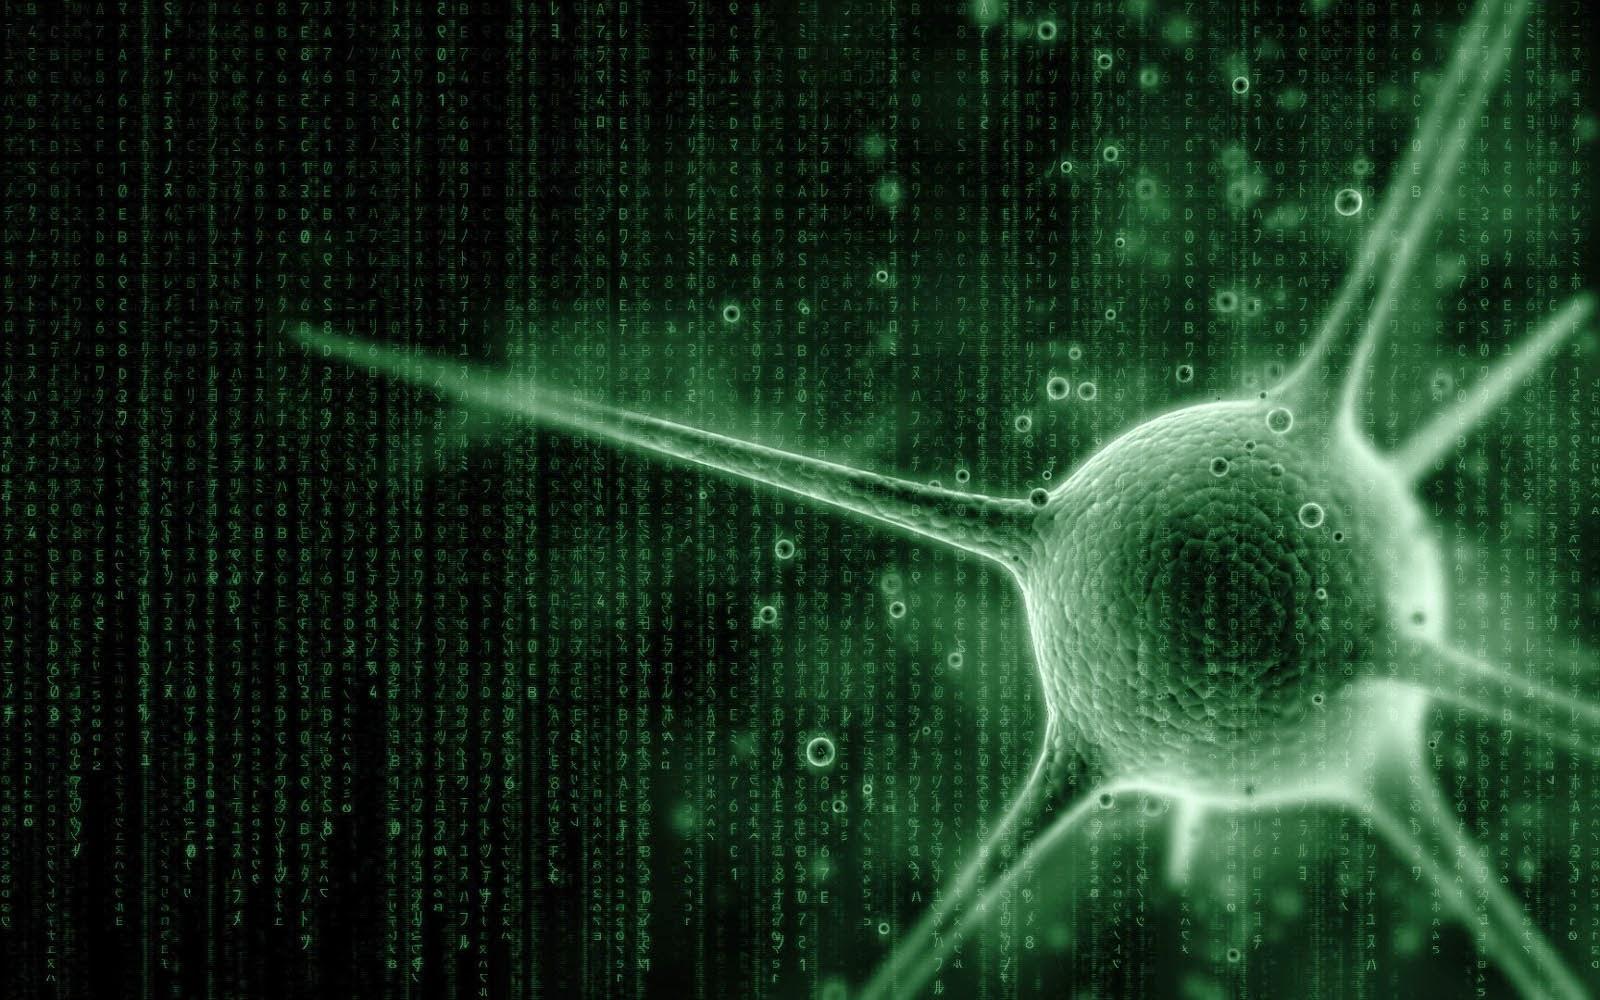 wallpapers: 3D Virus Wallpapers